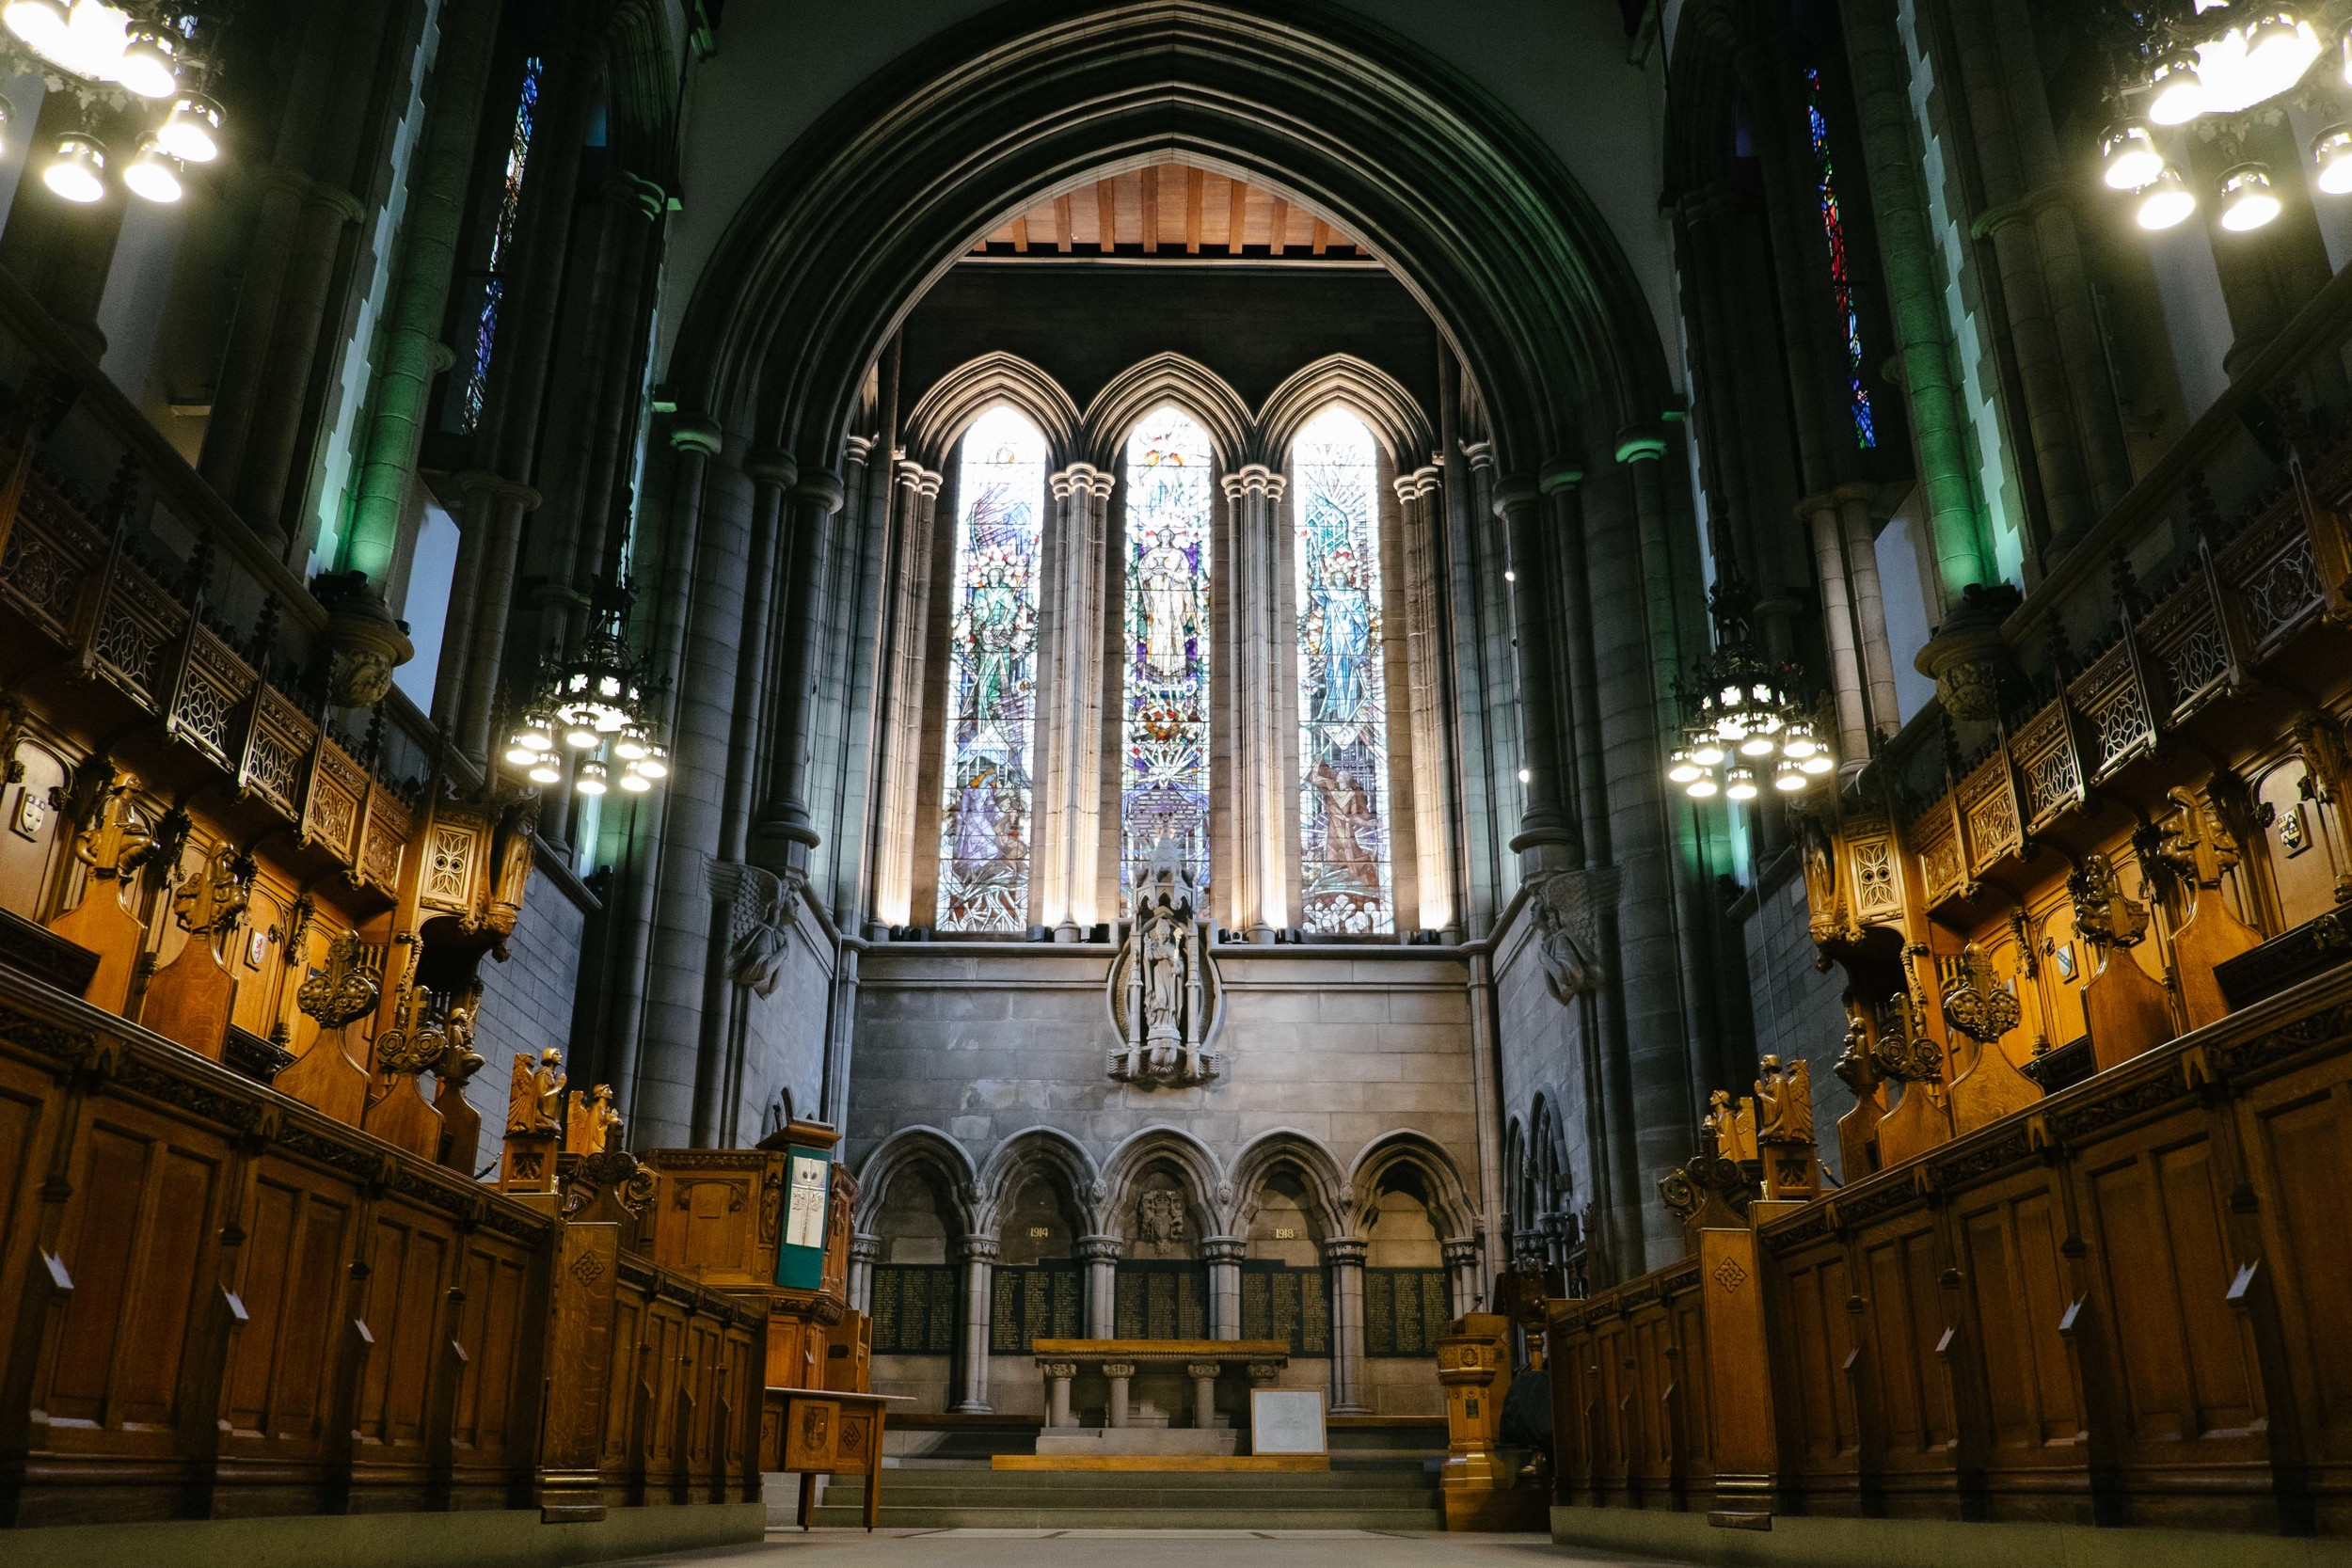 University of Glasgow Memorial Chapel